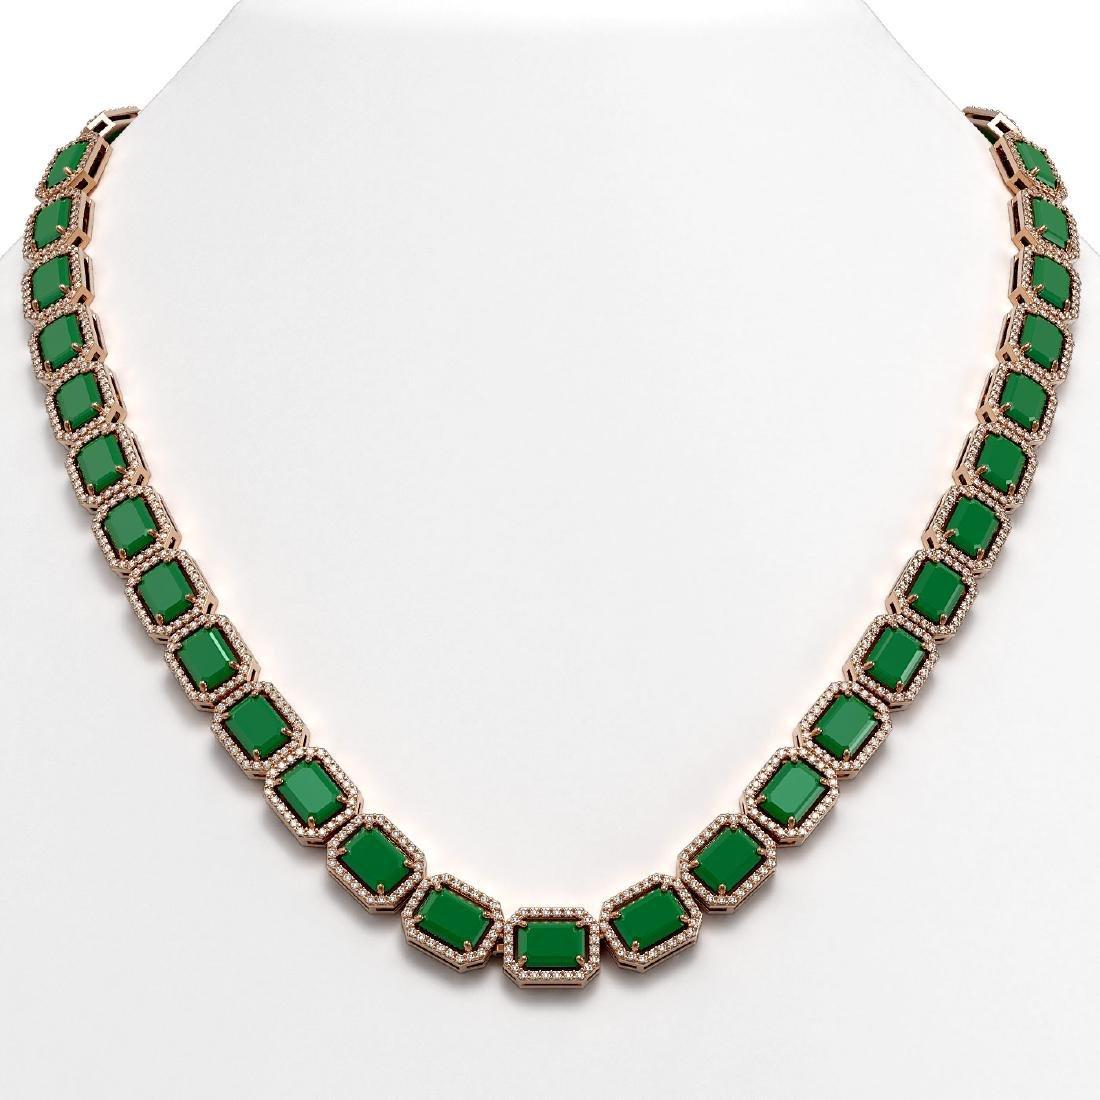 58.59 CTW Emerald & Diamond Halo Necklace 10K Rose Gold